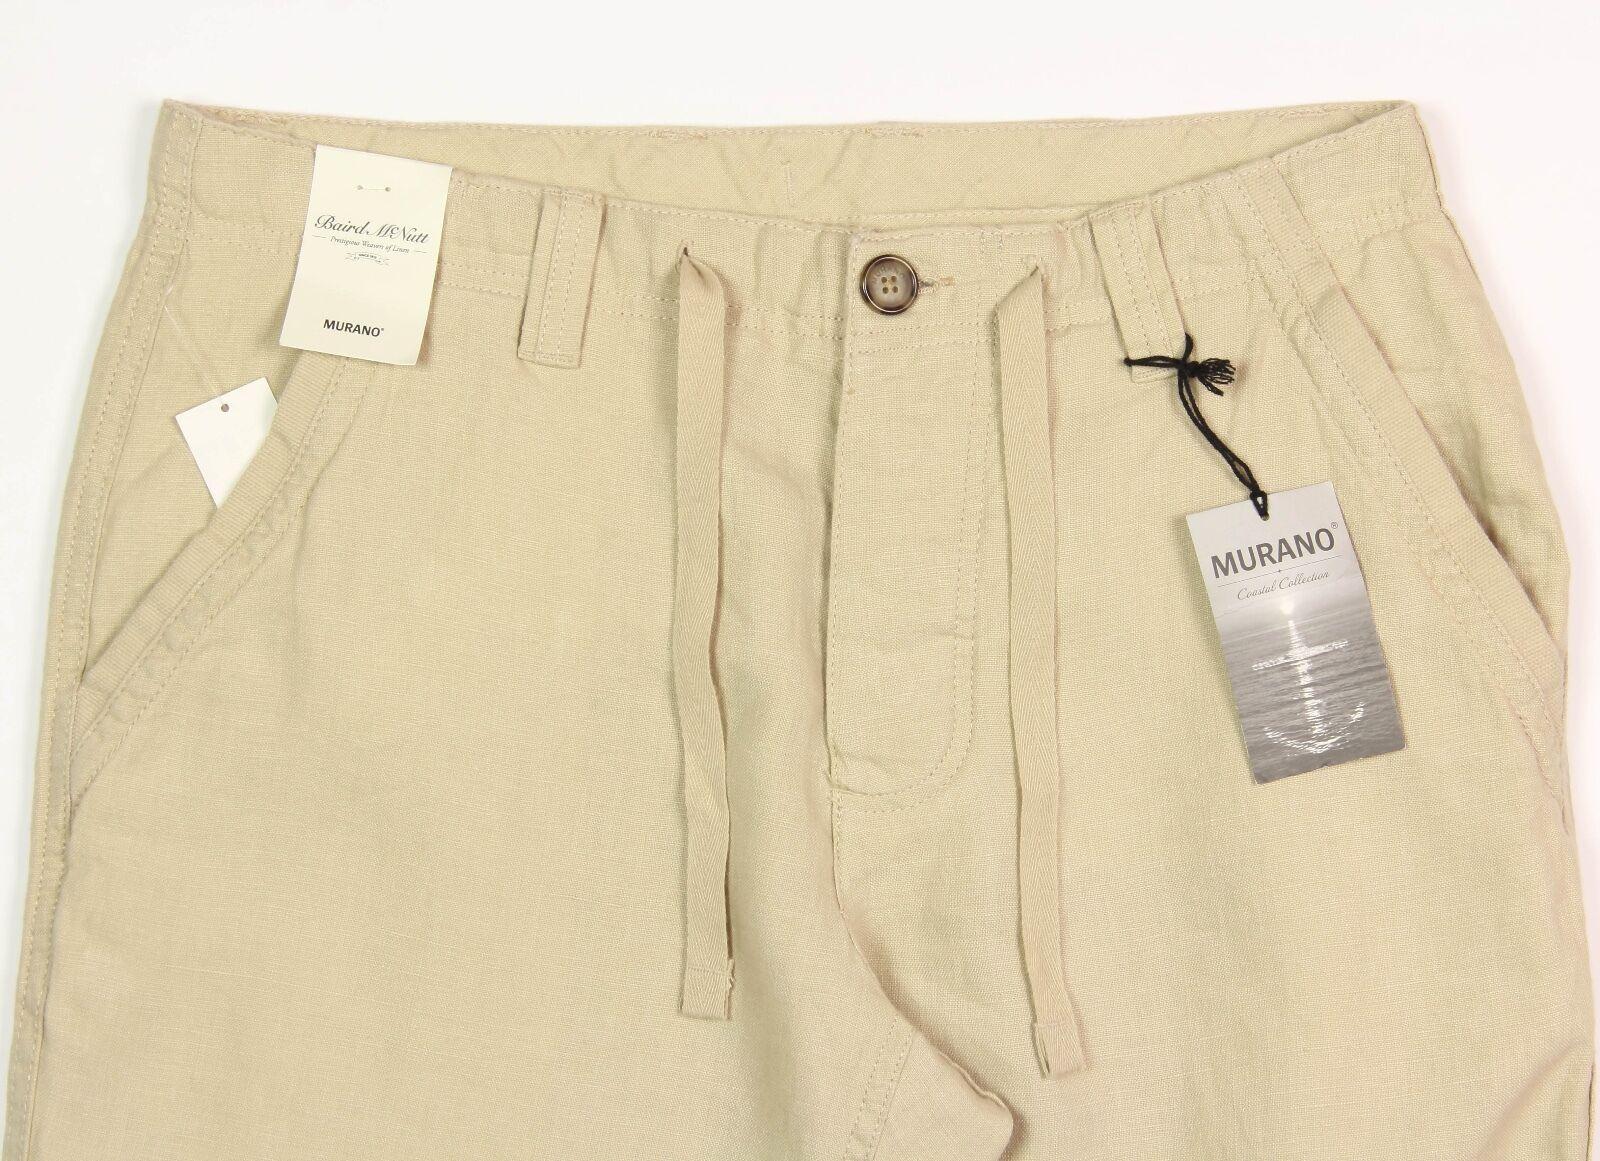 Men's MURANO Khaki Wheat Beige LINEN Drawstring Pants 38x30 NEW NWT COOL   -730